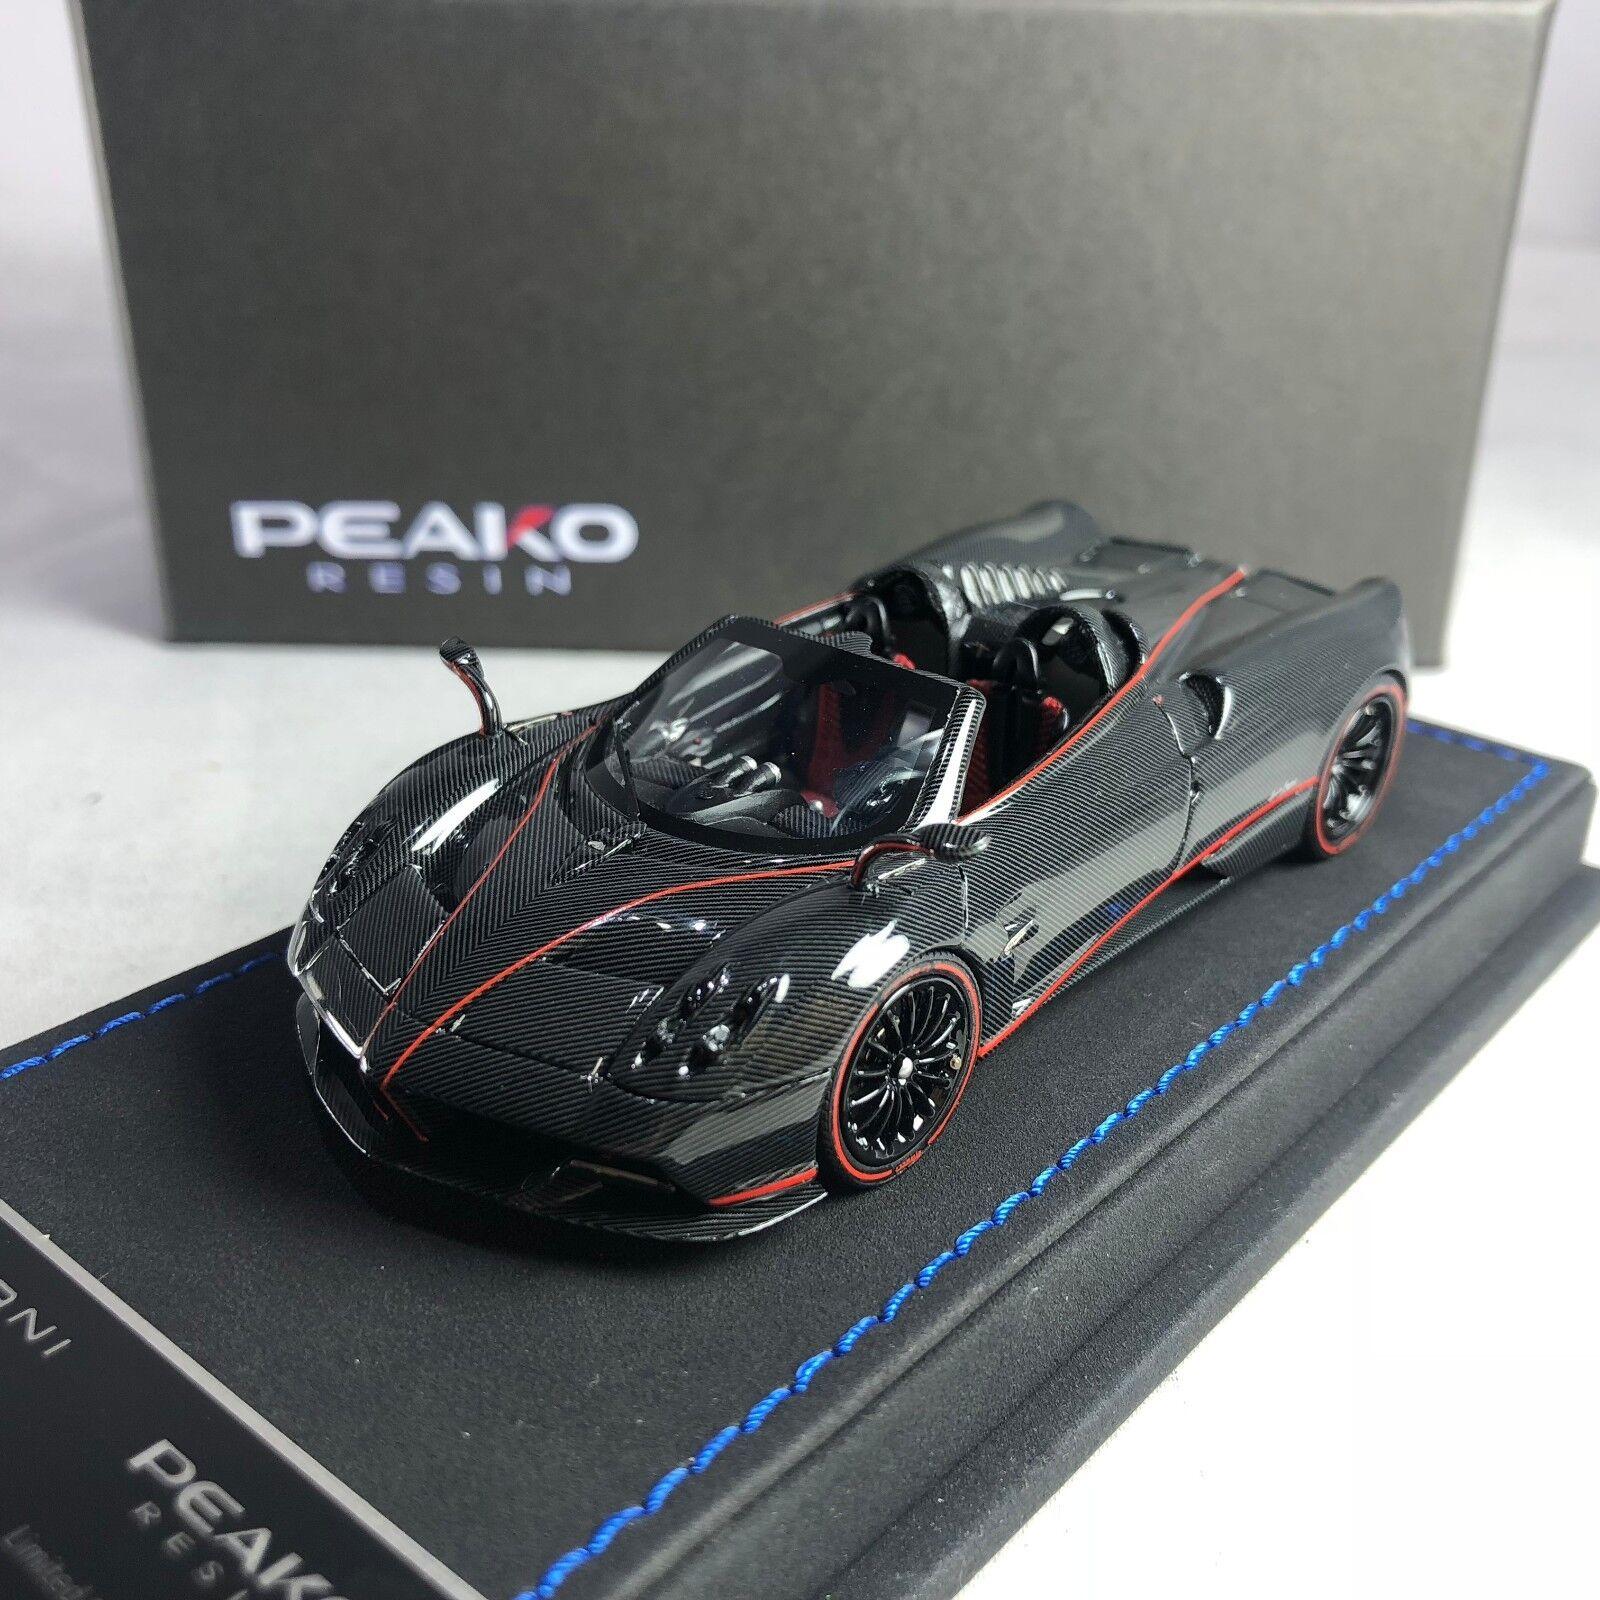 1 43 Peako Pagani Huayra Roadster Full Carbon with rojo Stripes Ltd 50 pcs 31117